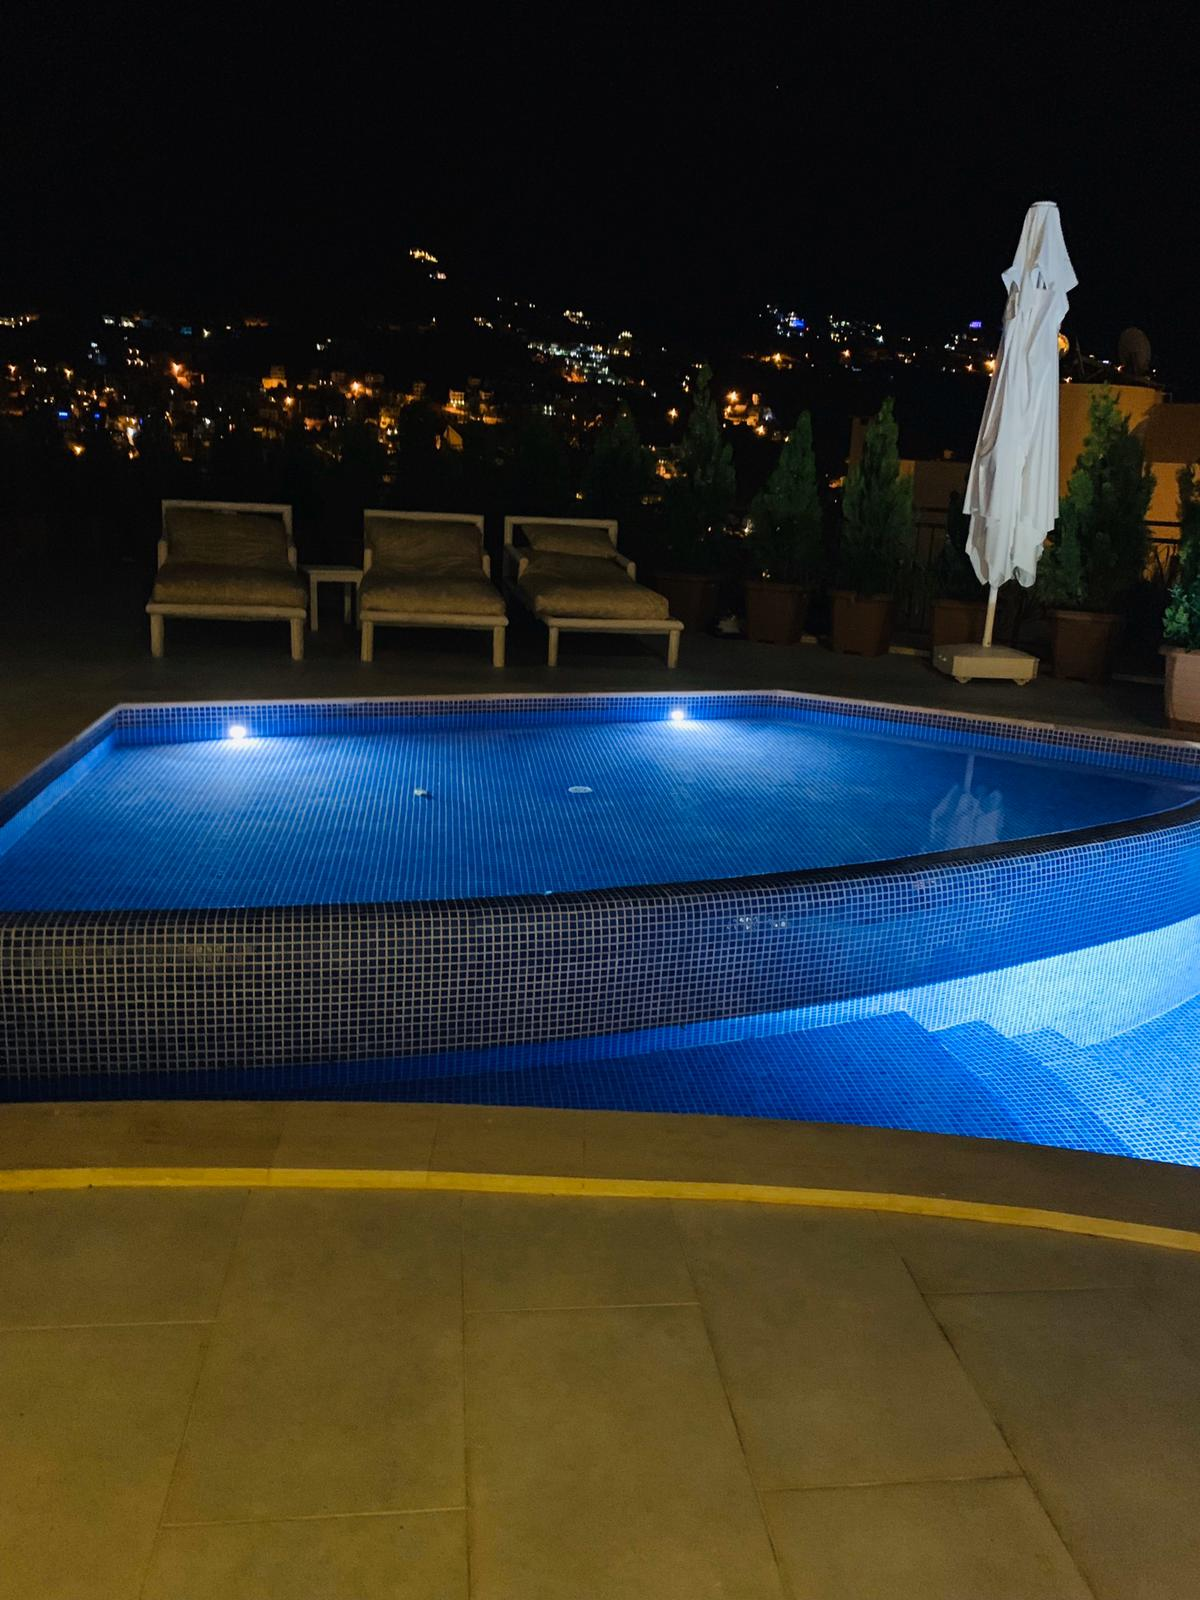 V840 pool lights